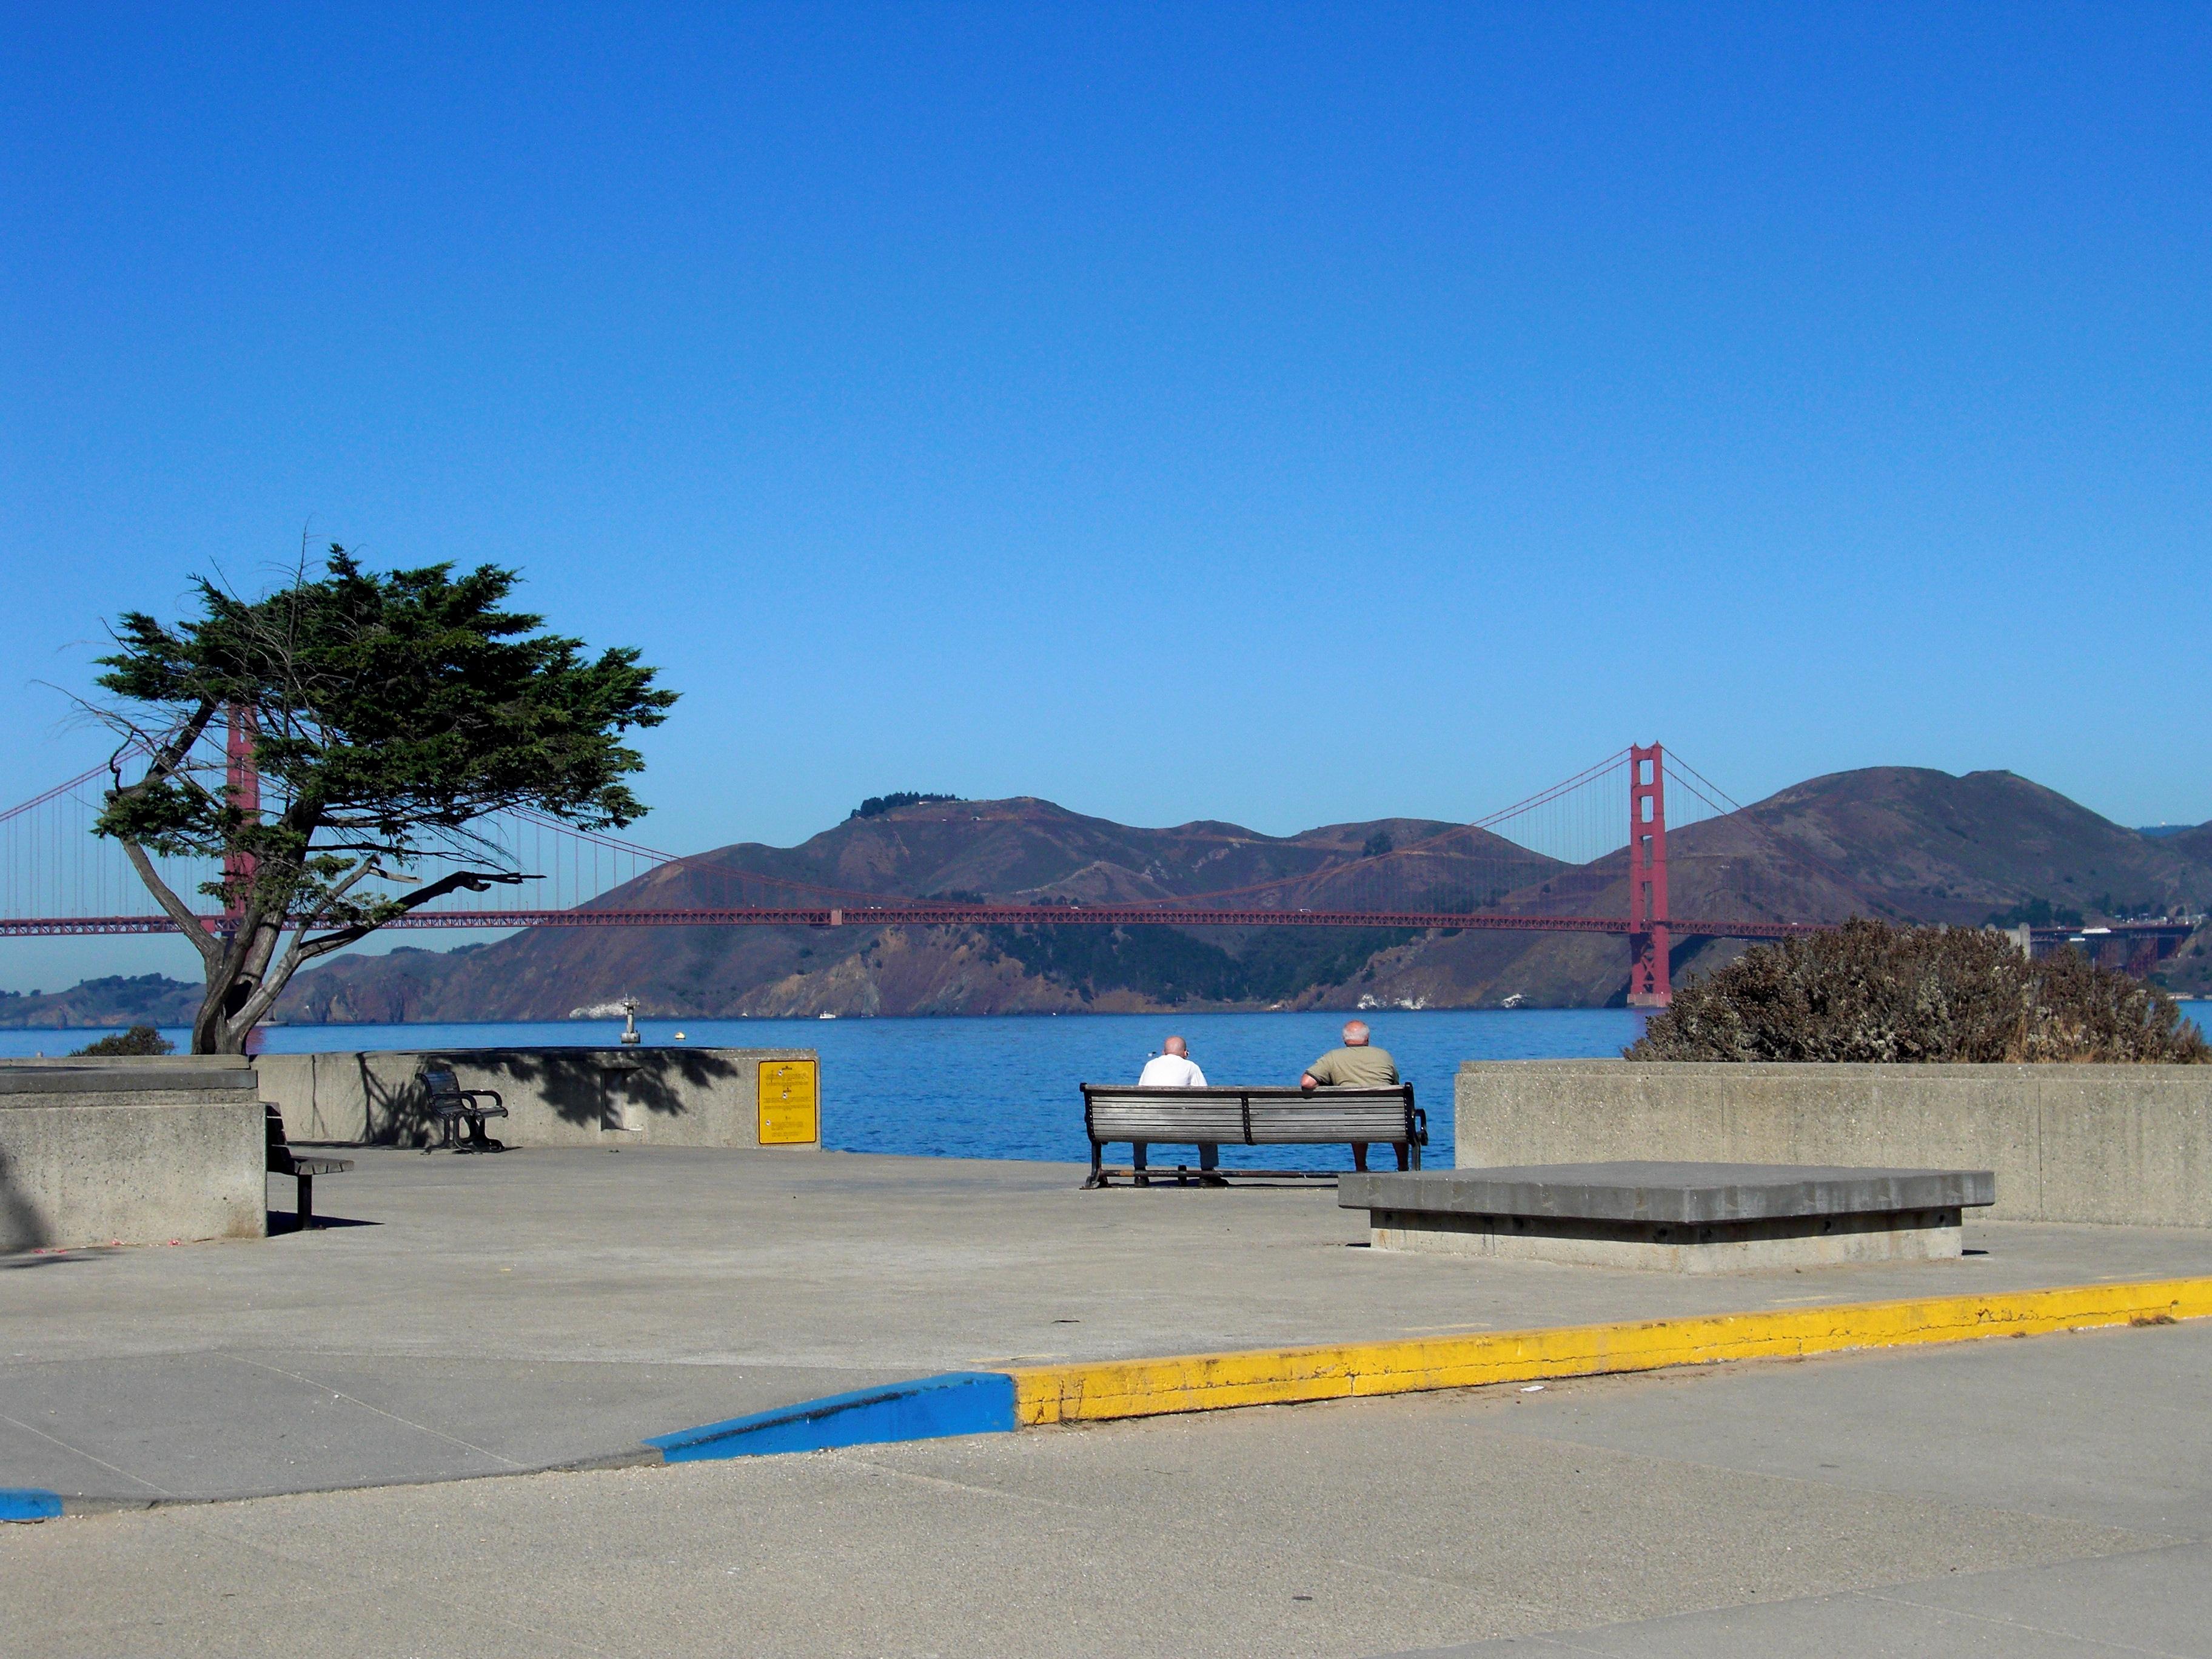 California, Bay, Landmarks, View, Tree, HQ Photo